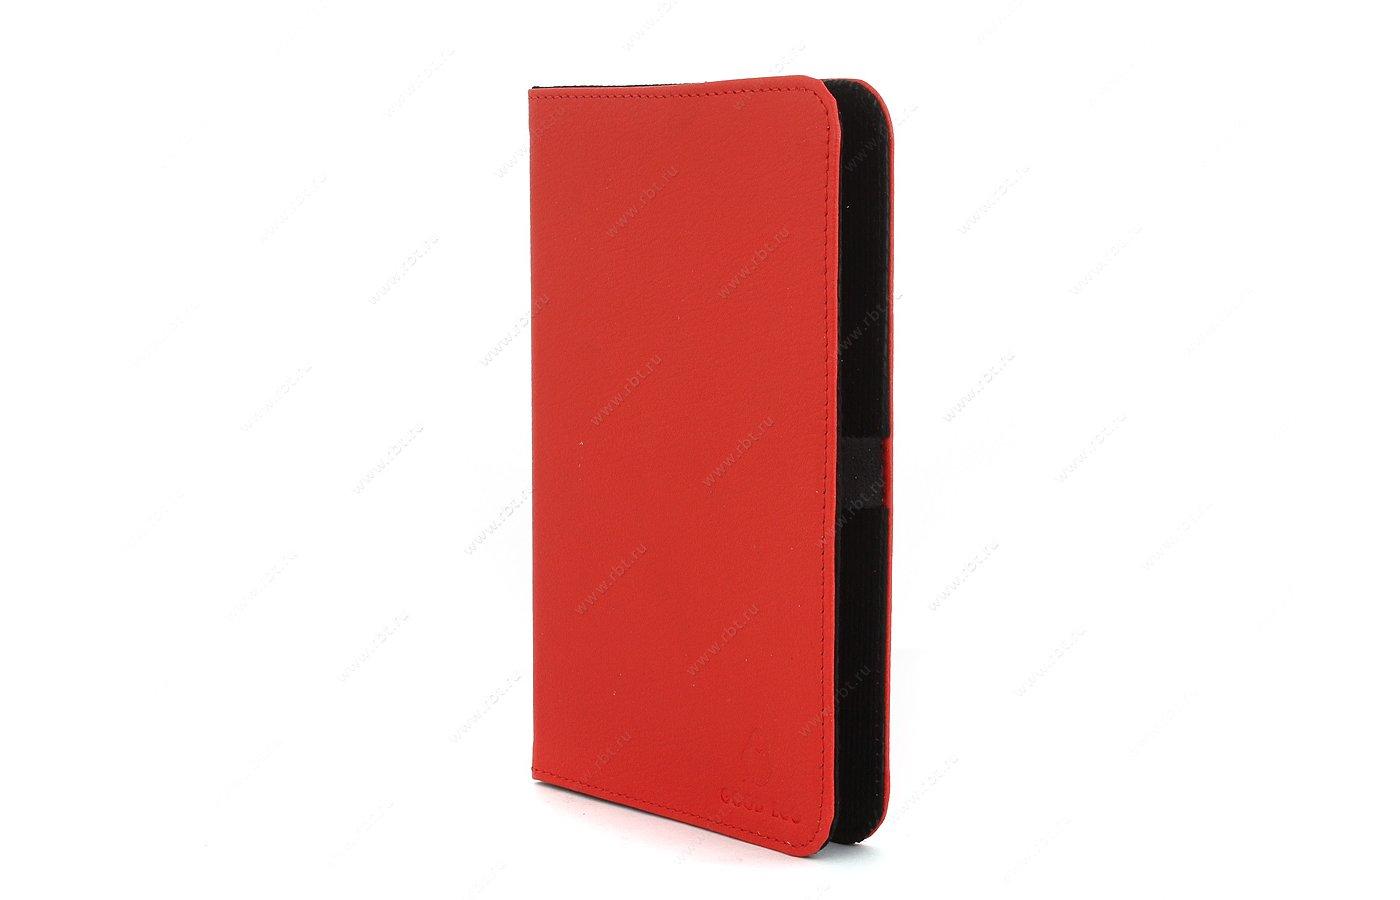 Чехол GoodEgg для PocketBook 614/624/626/640 кожа красный (GE-PB624LIR2210)